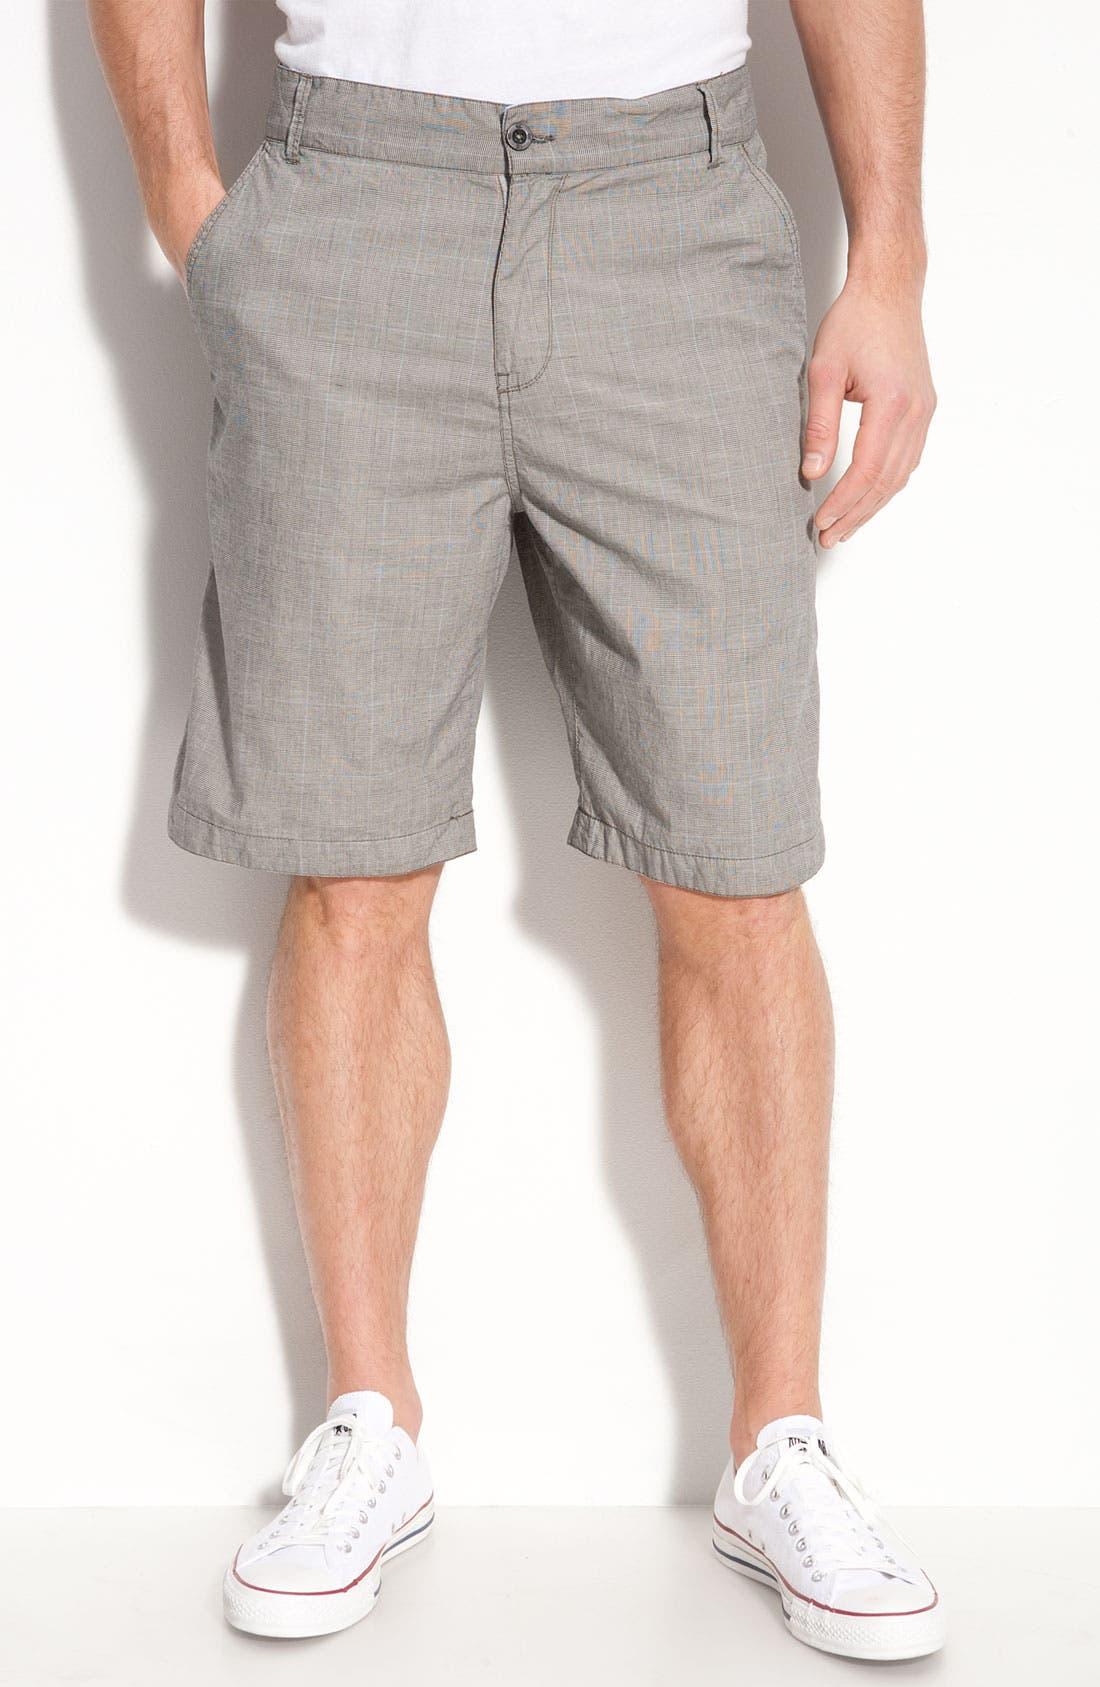 Alternate Image 1 Selected - Canterbury of New Zealand 'Drift' Shorts